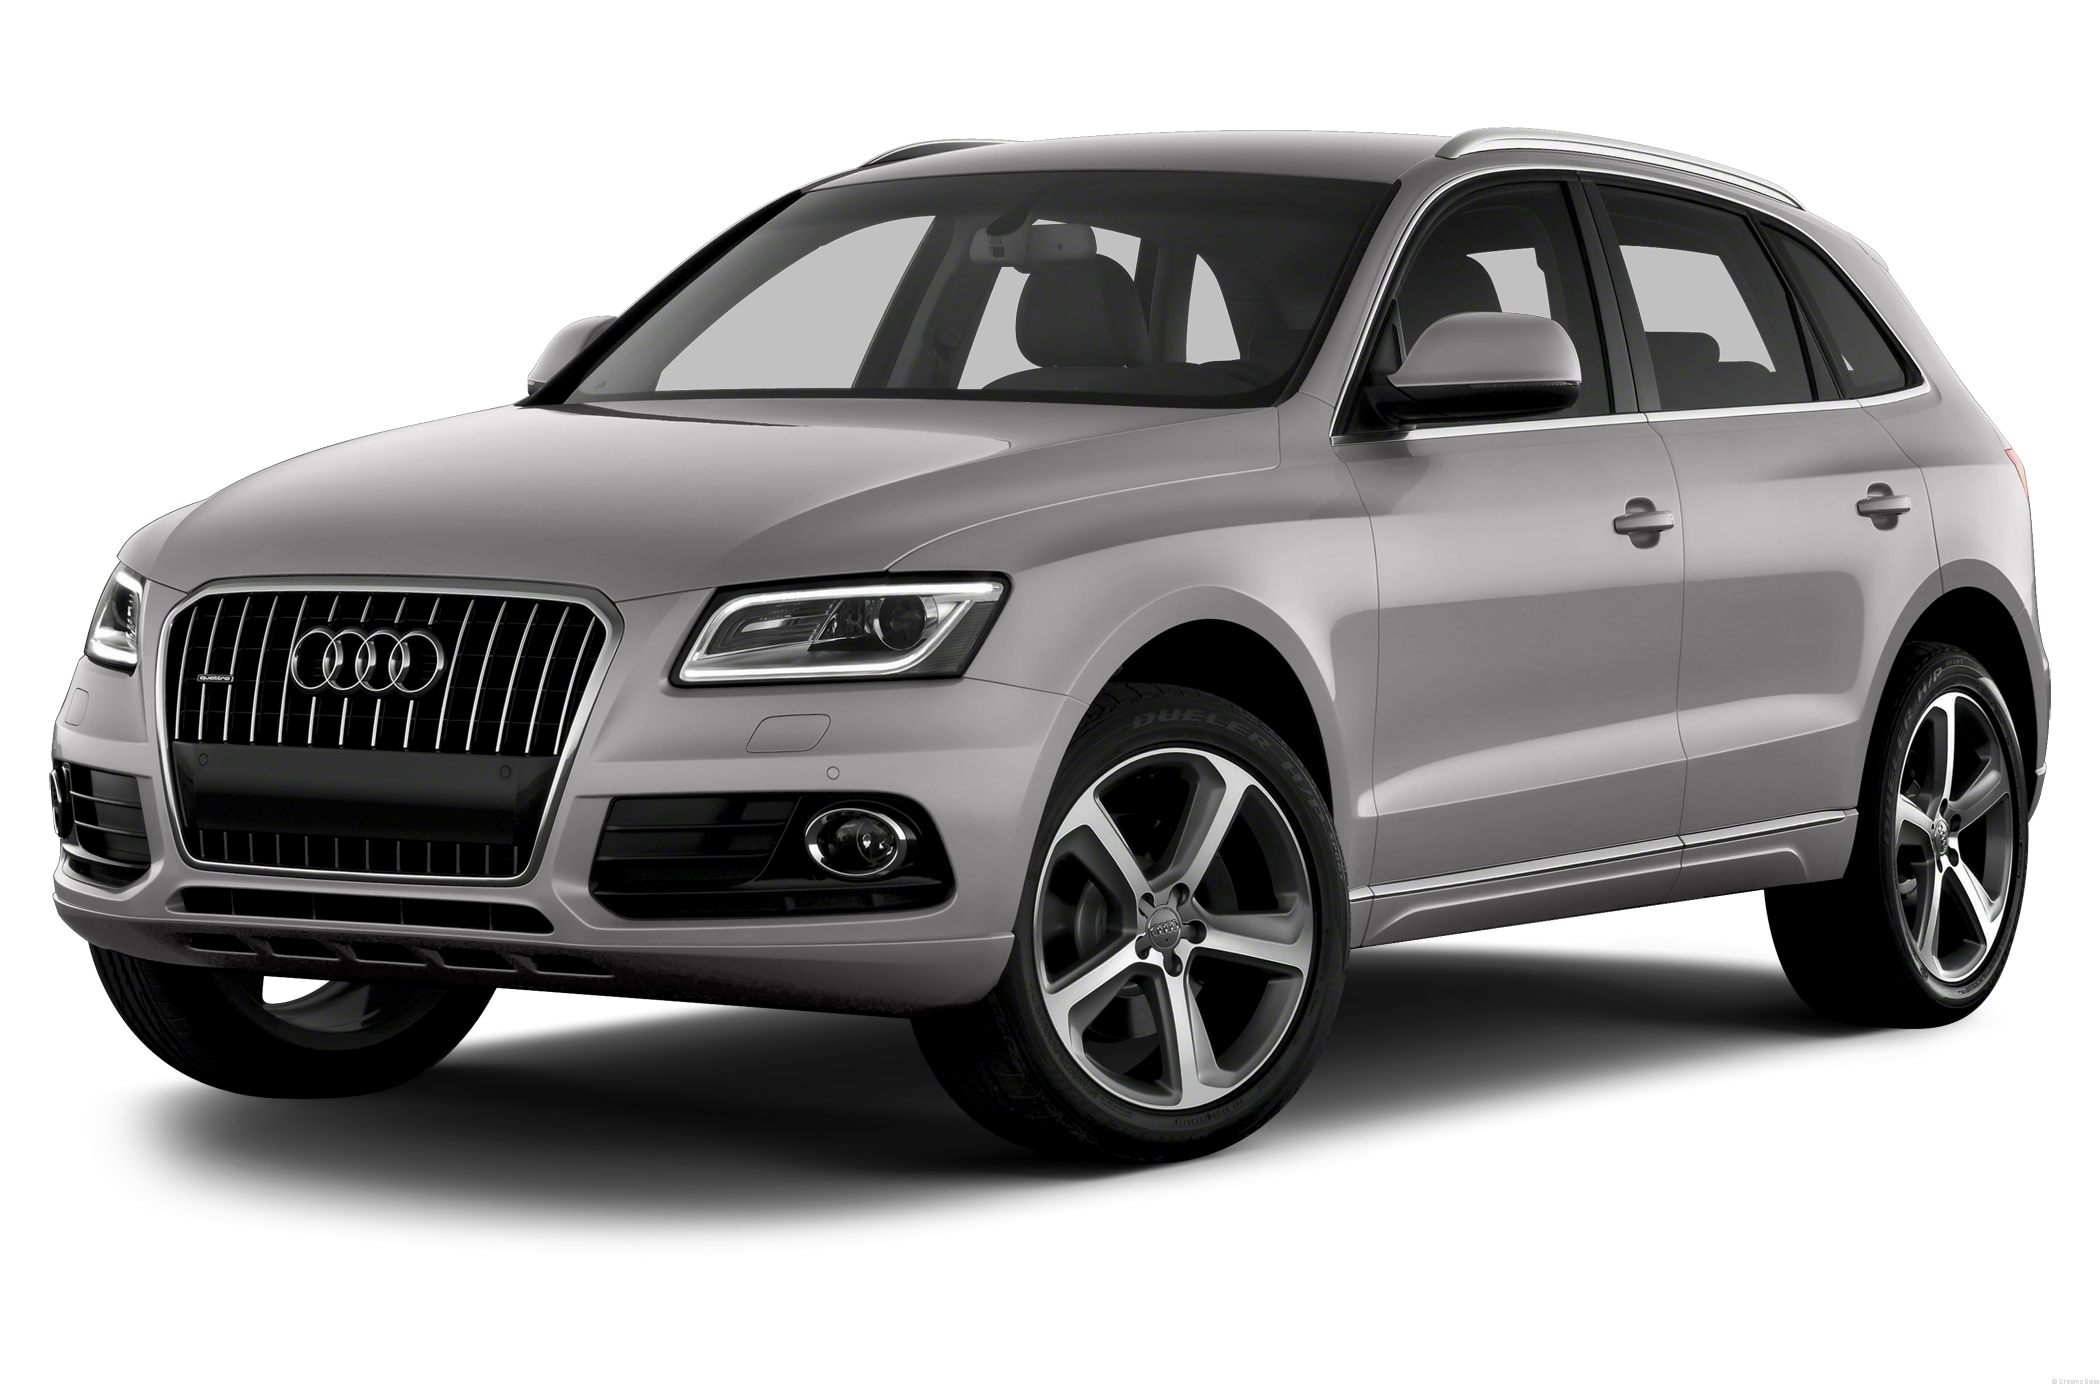 Kelebihan Kekurangan Audi Q5 2013 Review